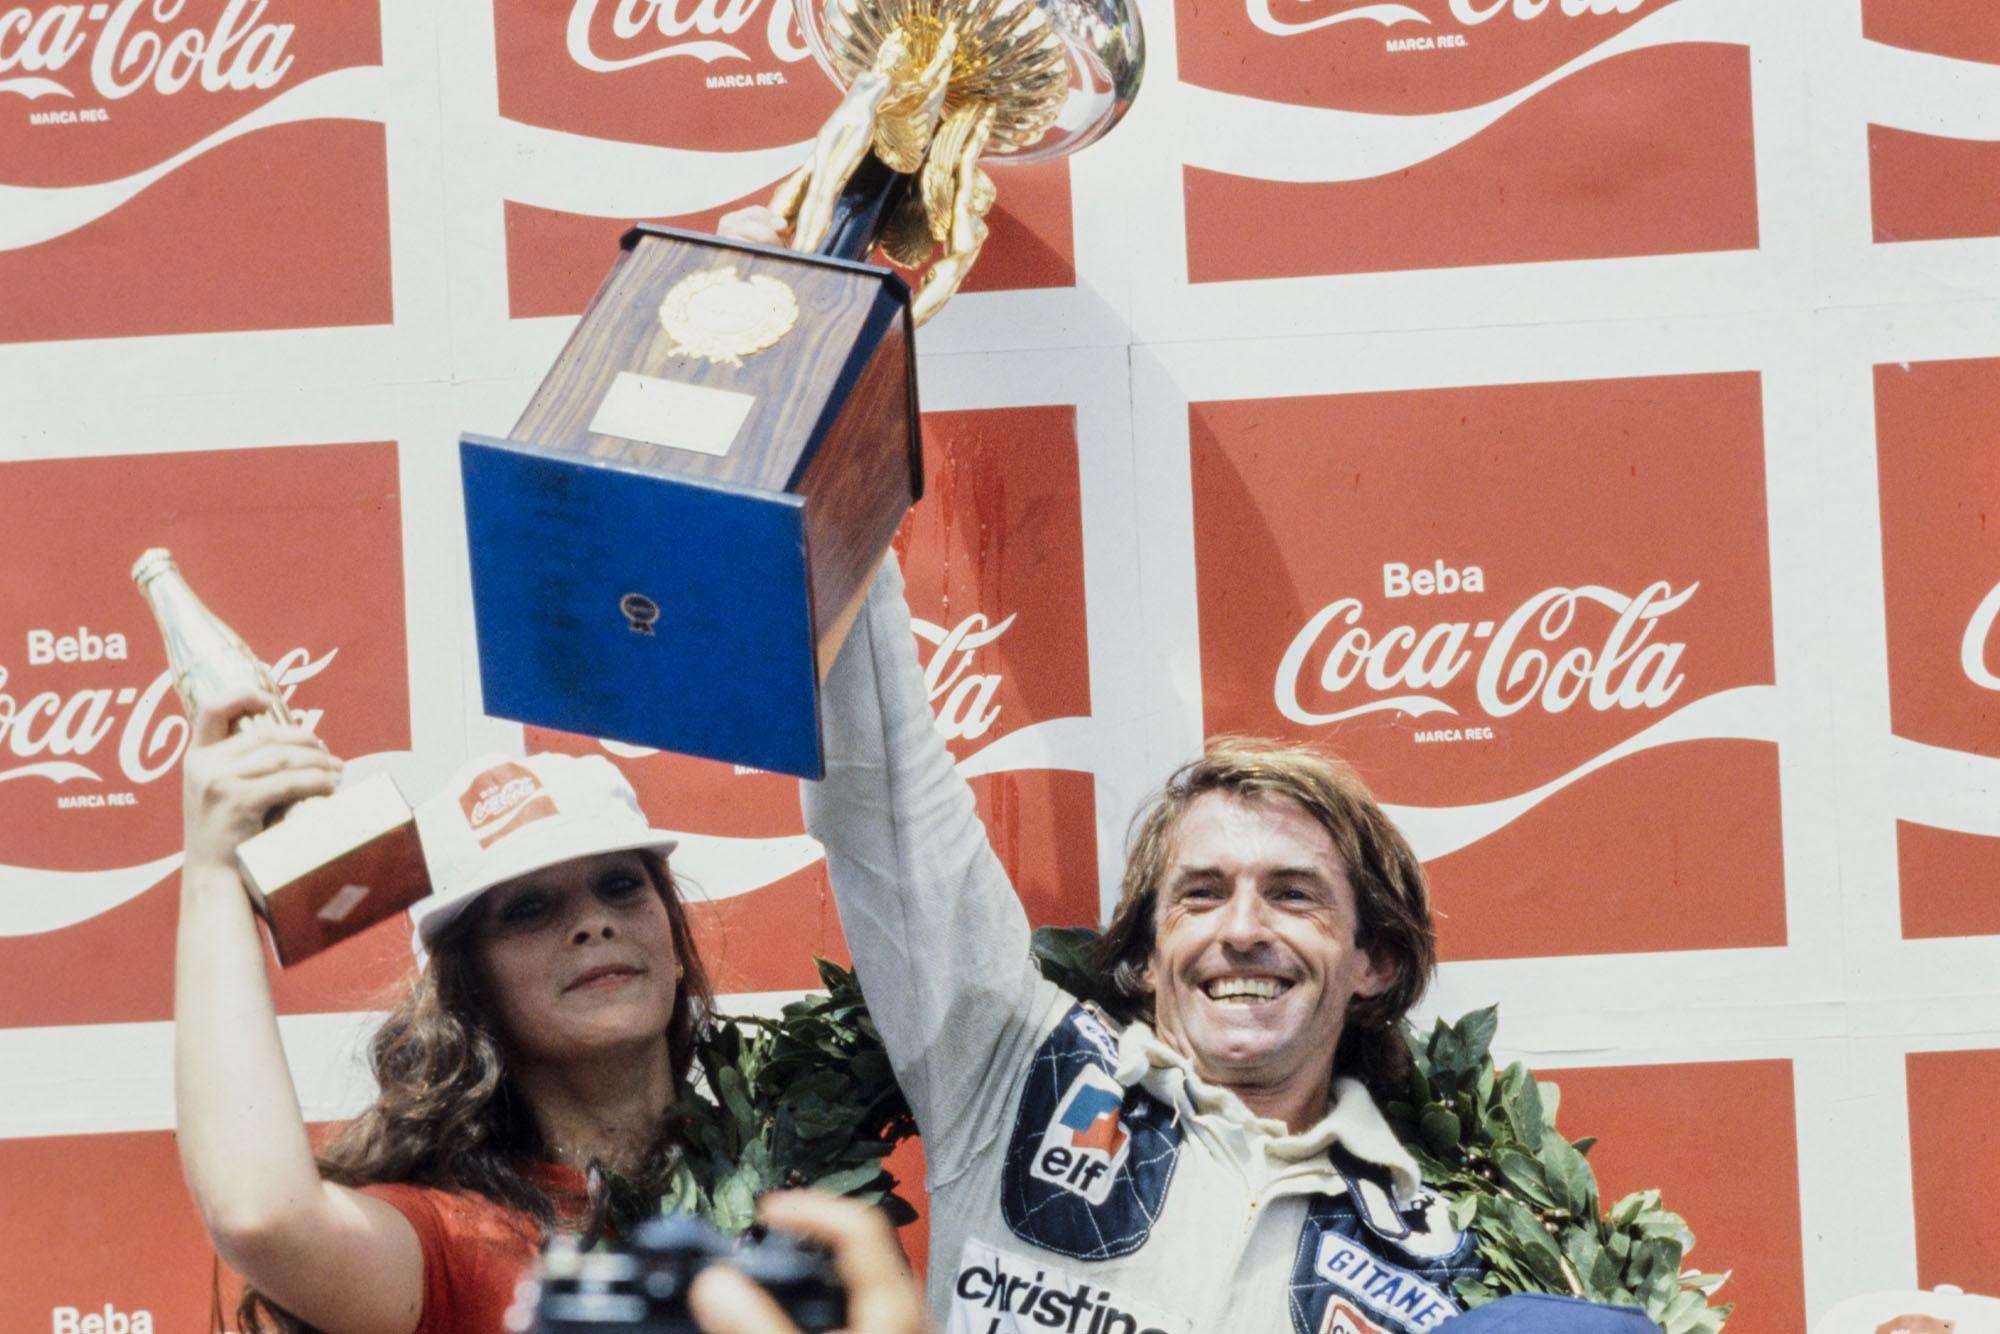 Jacques Laffite (Ligier) celebrates on the podium after winning the 1979 Brazilian Grand Prix.